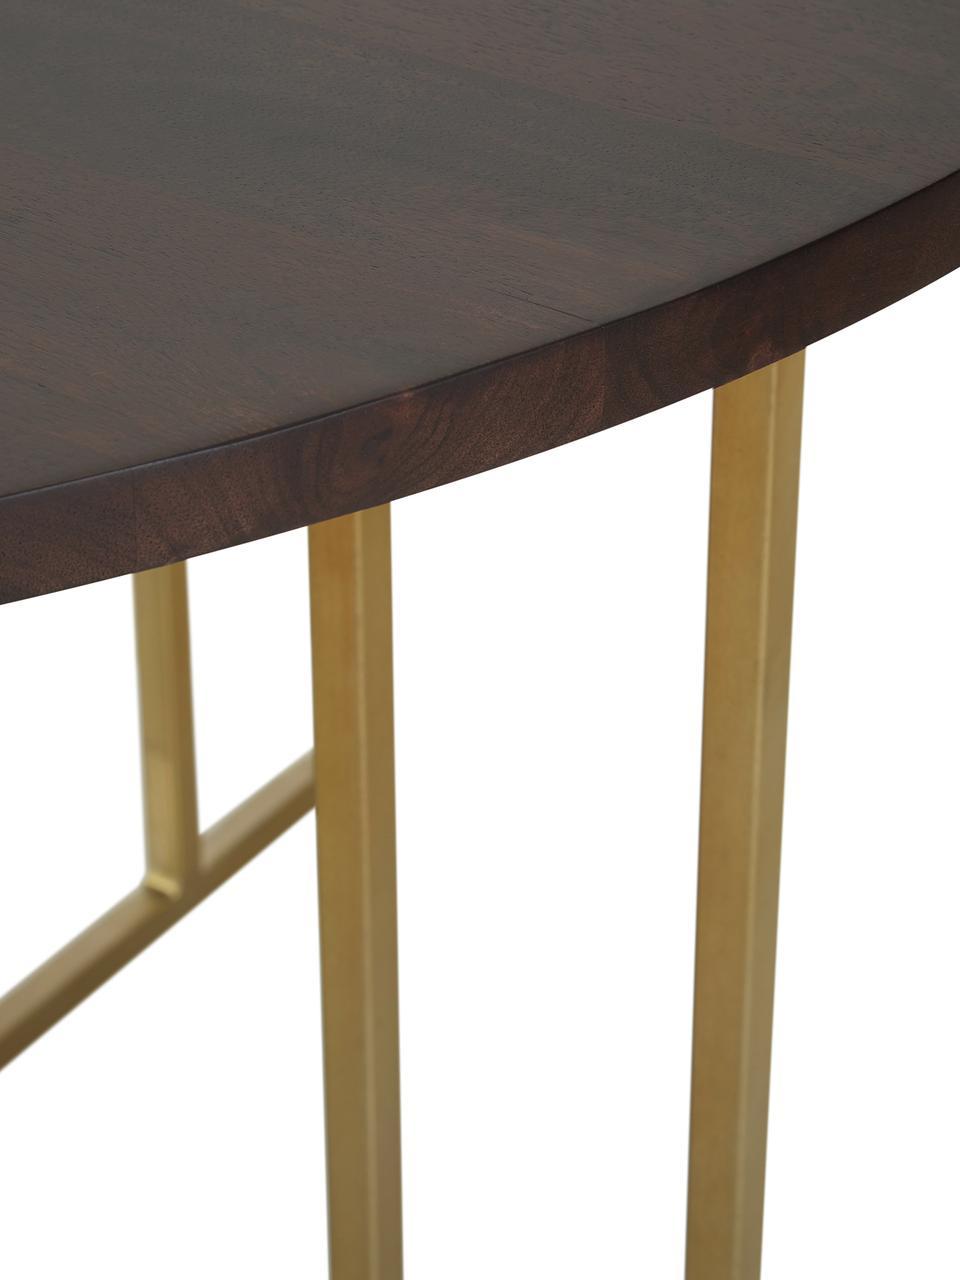 Runder Massivholz Esstisch Luca in Braun, Tischplatte: Massives Mangoholz, gebür, Gestell: Metall, pulverbeschichtet, Tischplatte: Mangoholz, dunkel lackiertGestell: Goldfarben, Ø 120 x H 75 cm